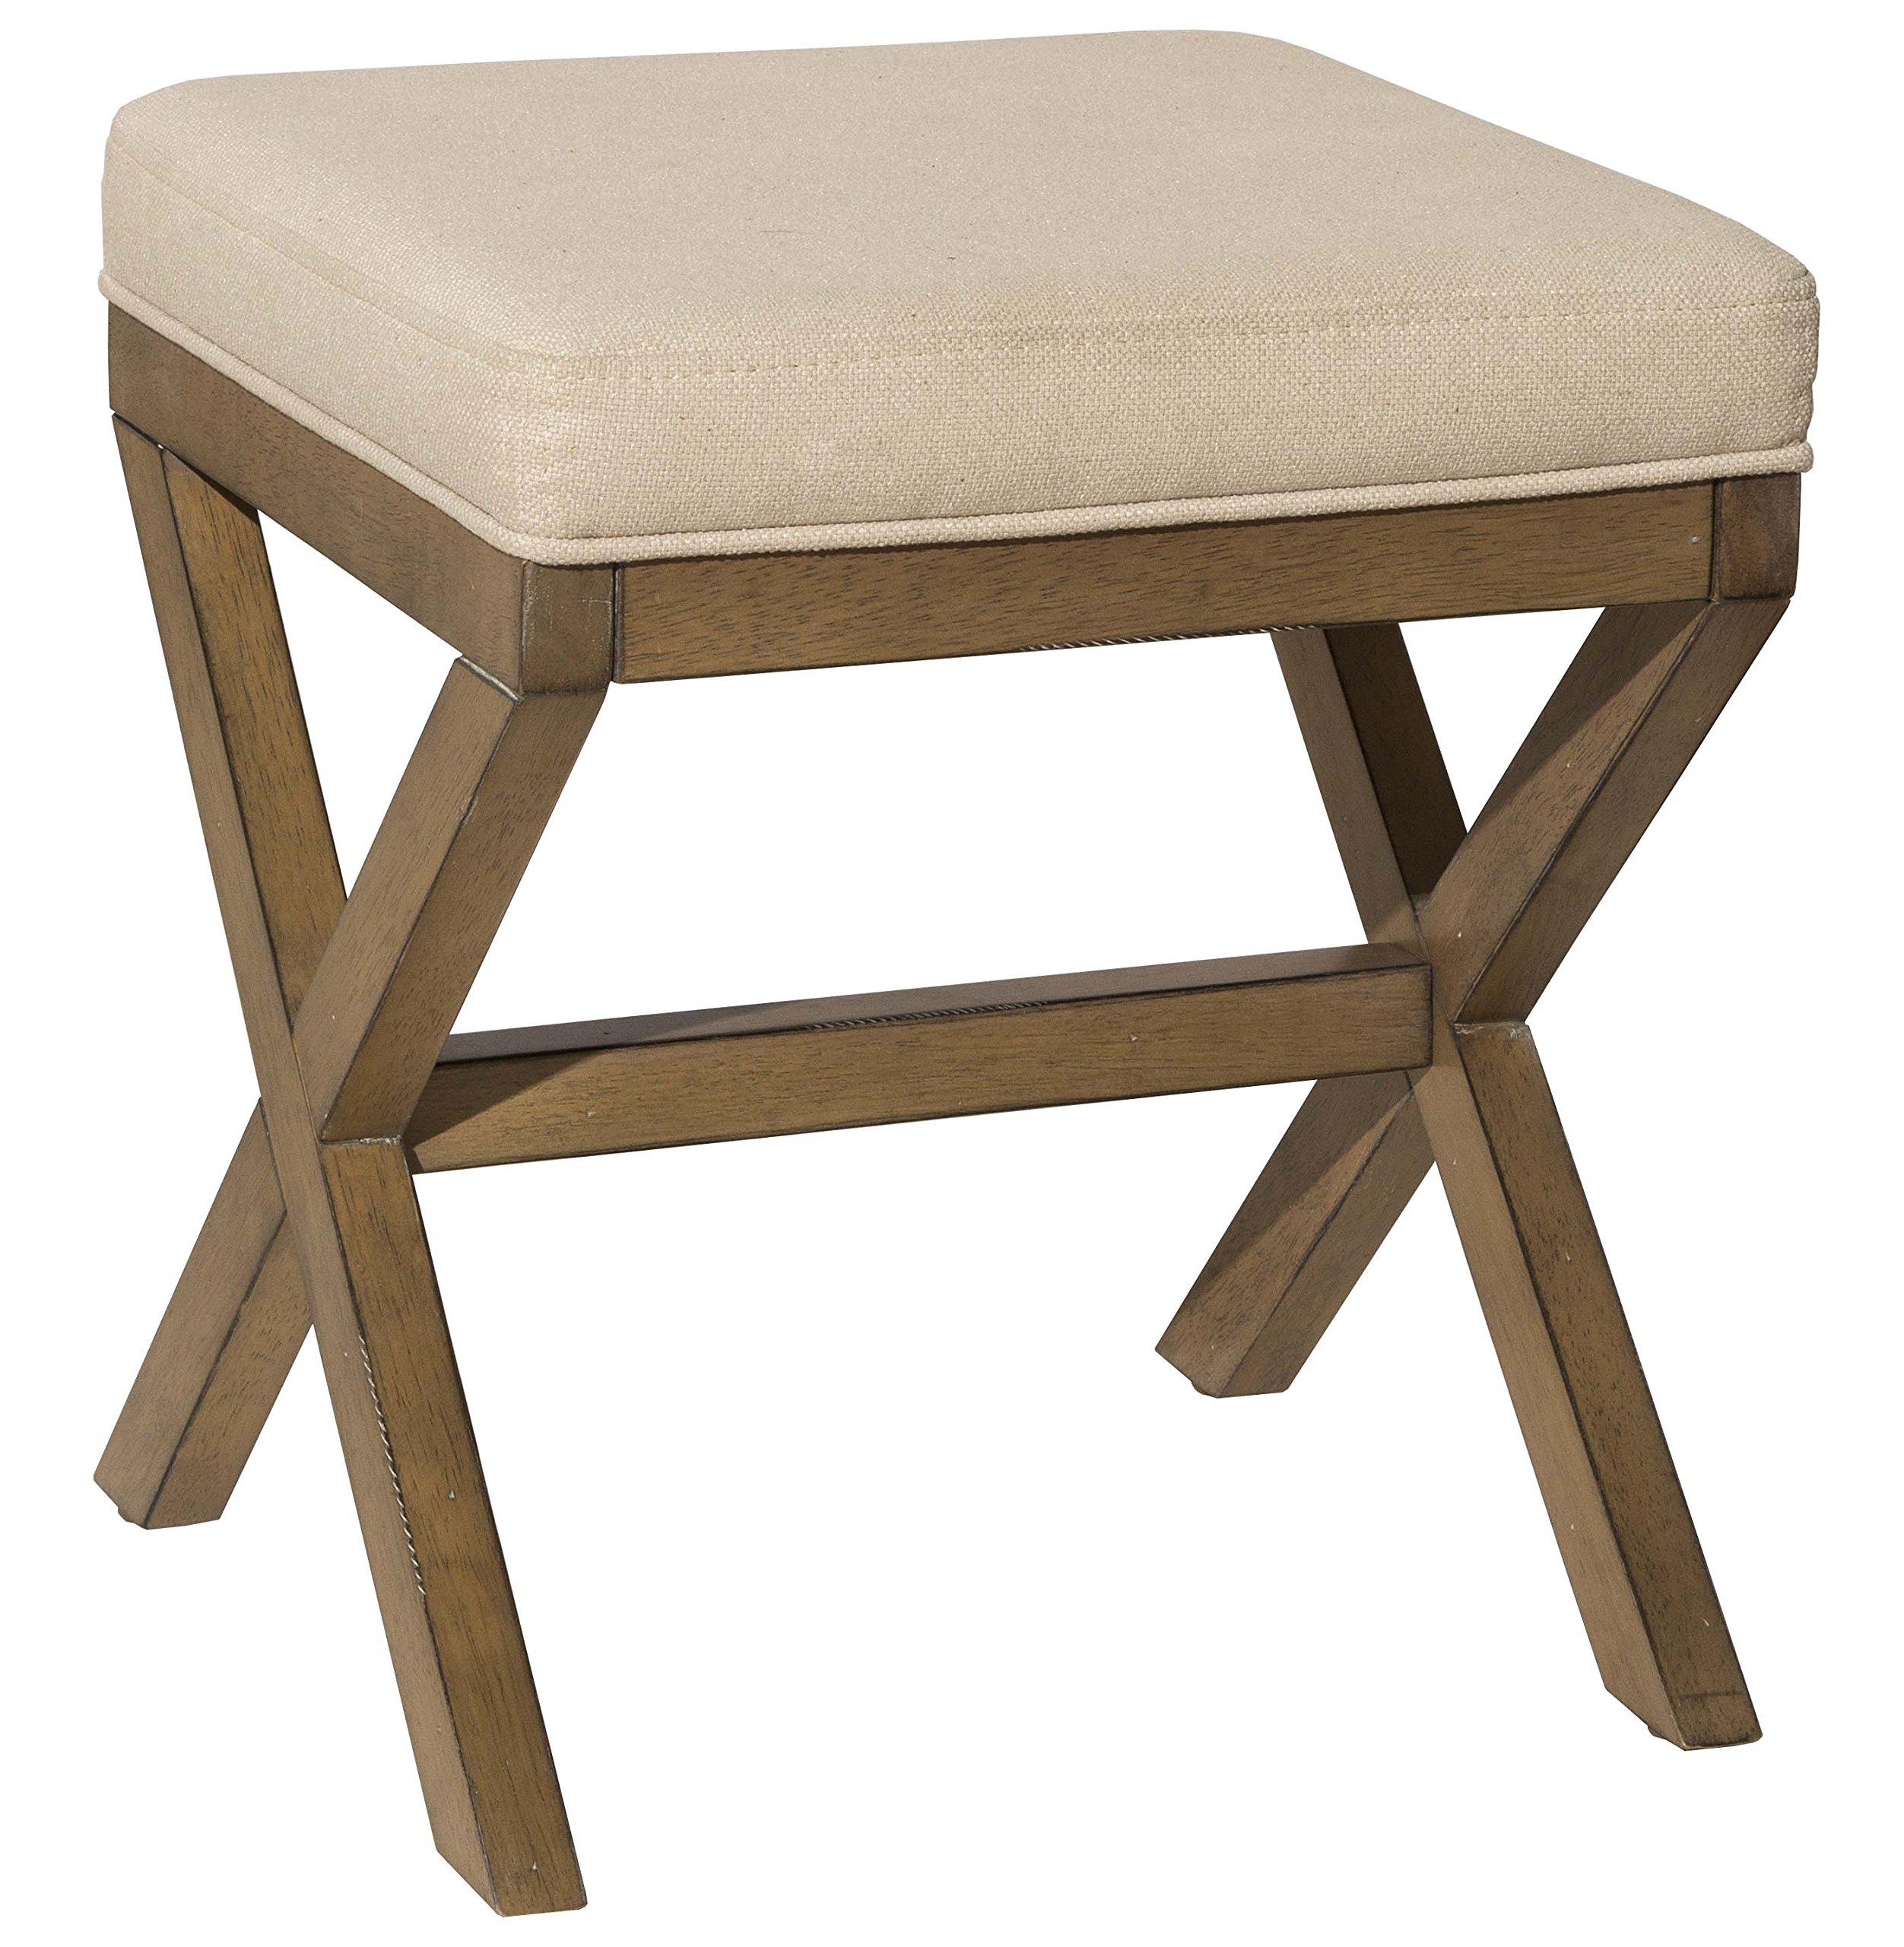 Hillsdale Furniture 51021 Somerset Vanity Bench, Driftwood